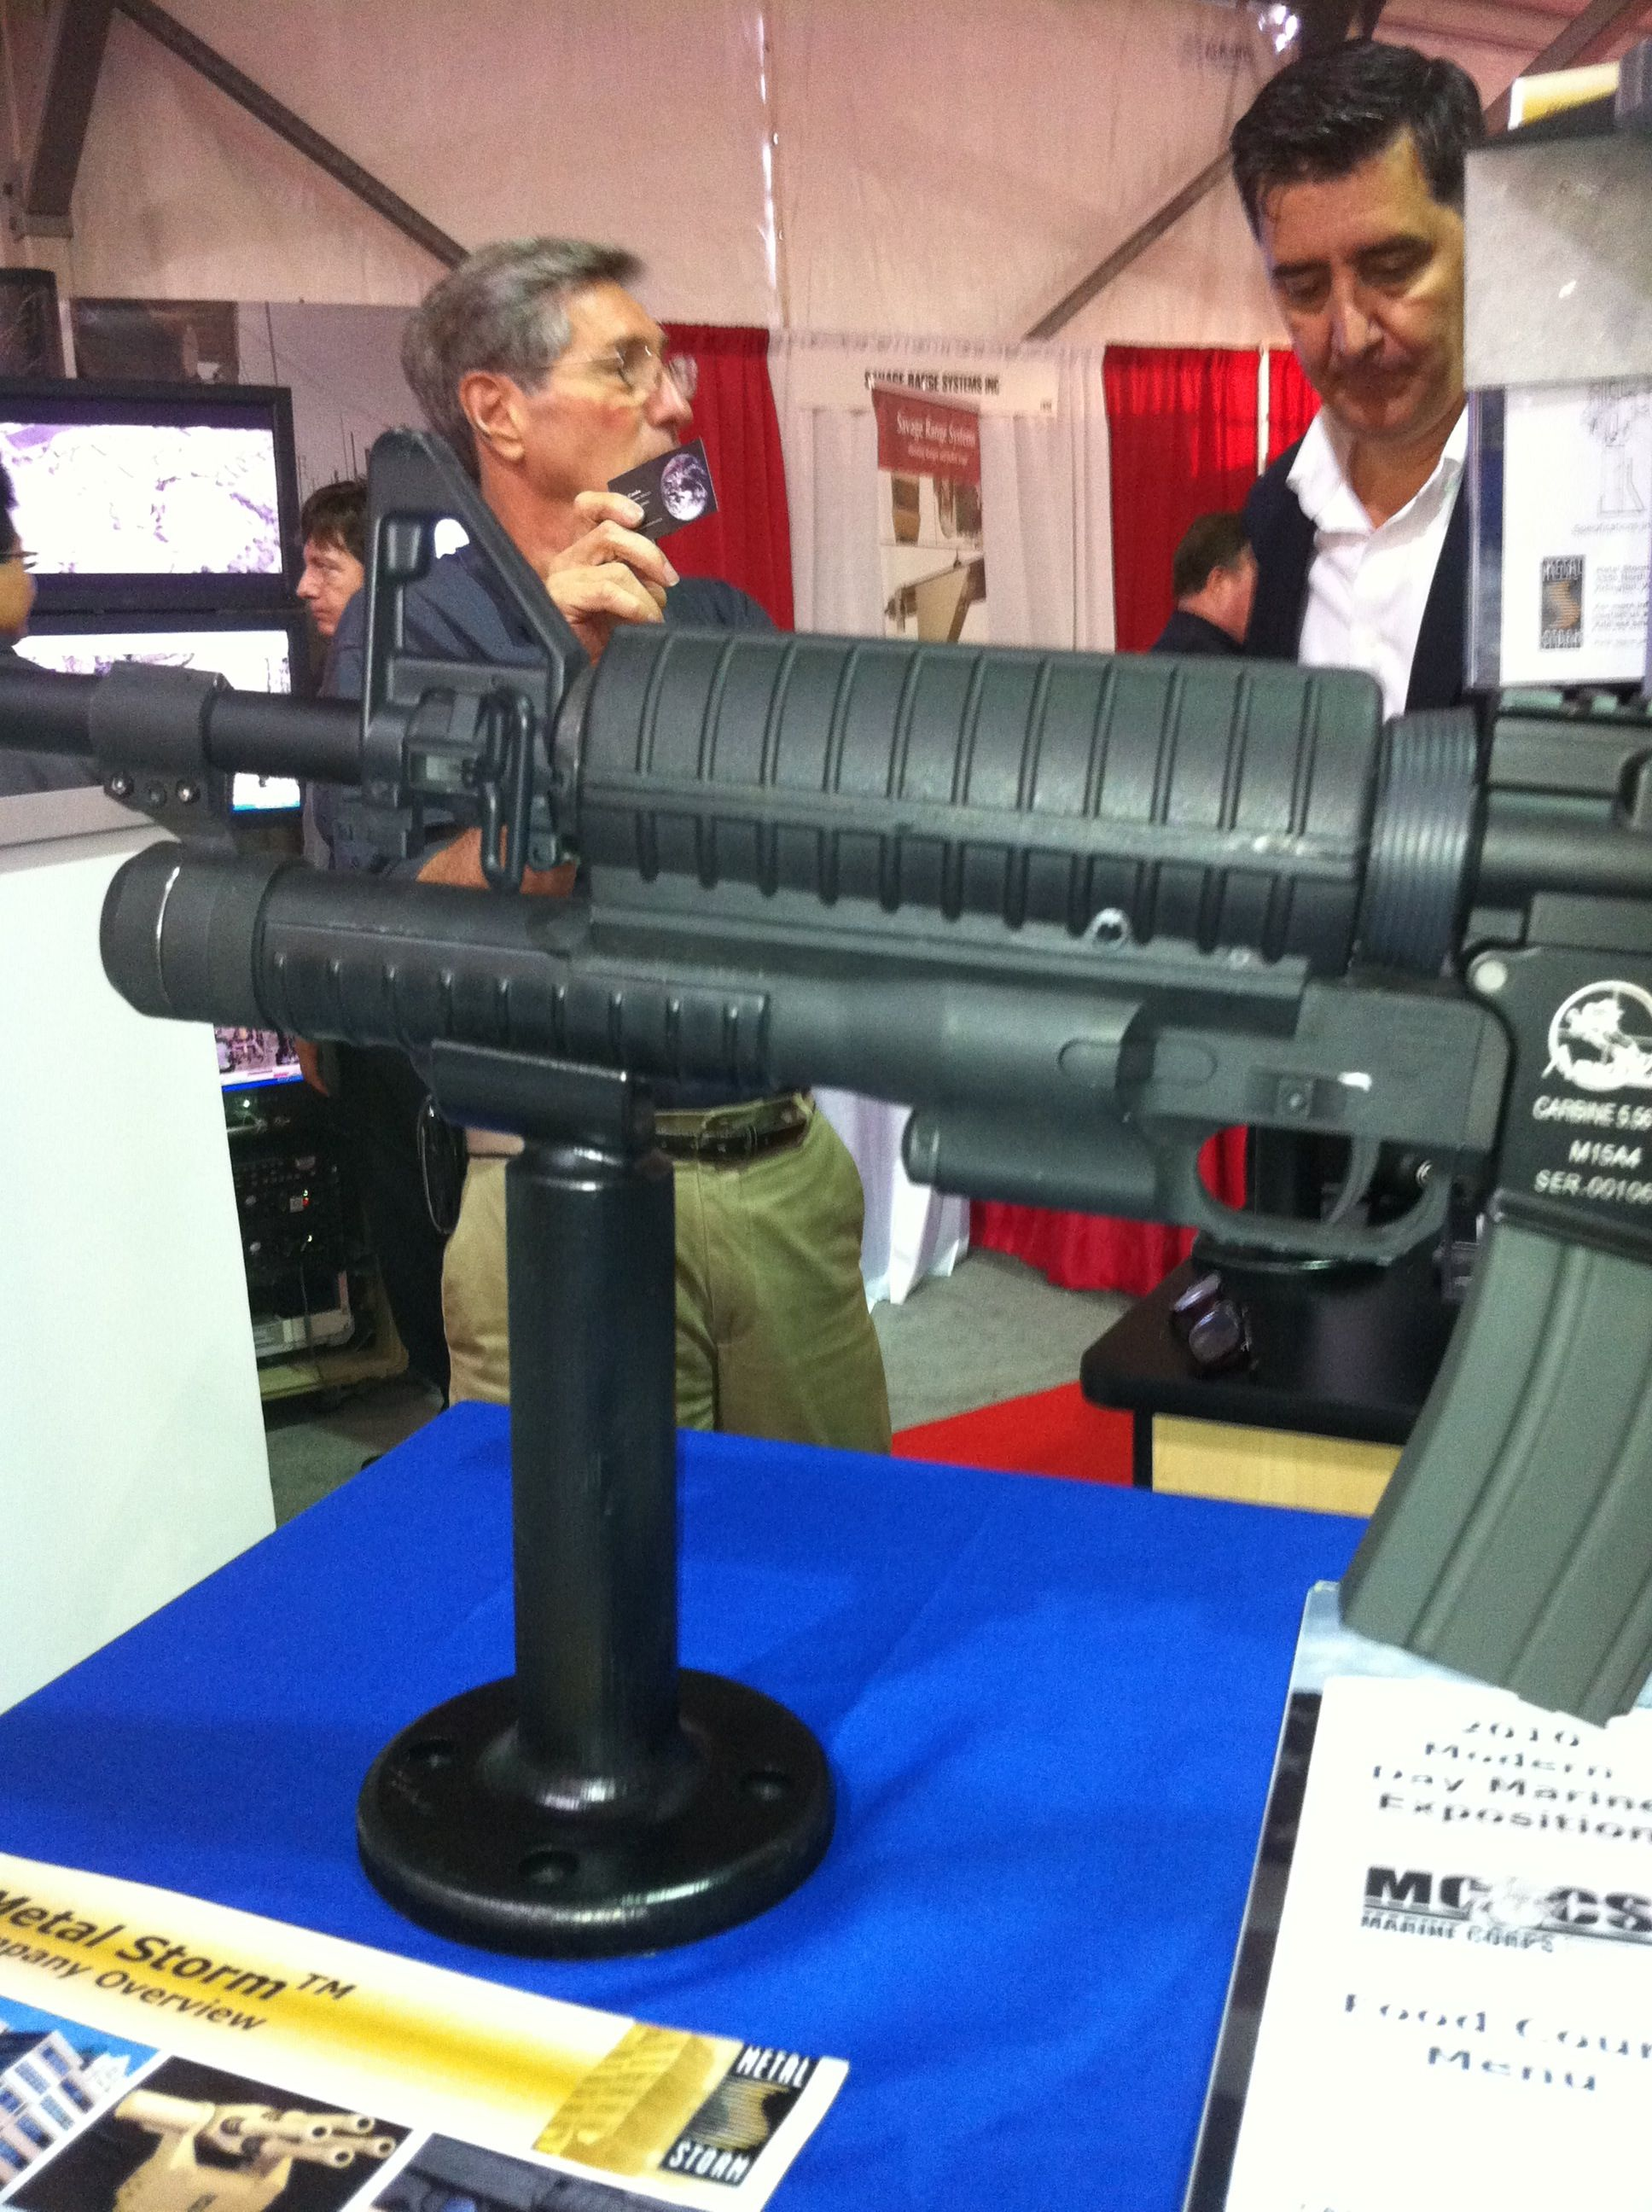 Metal Storm MAUL shotgun 18mm/12ga. Under barrel configuration | Weaponry | Pinterest | Shotguns ...